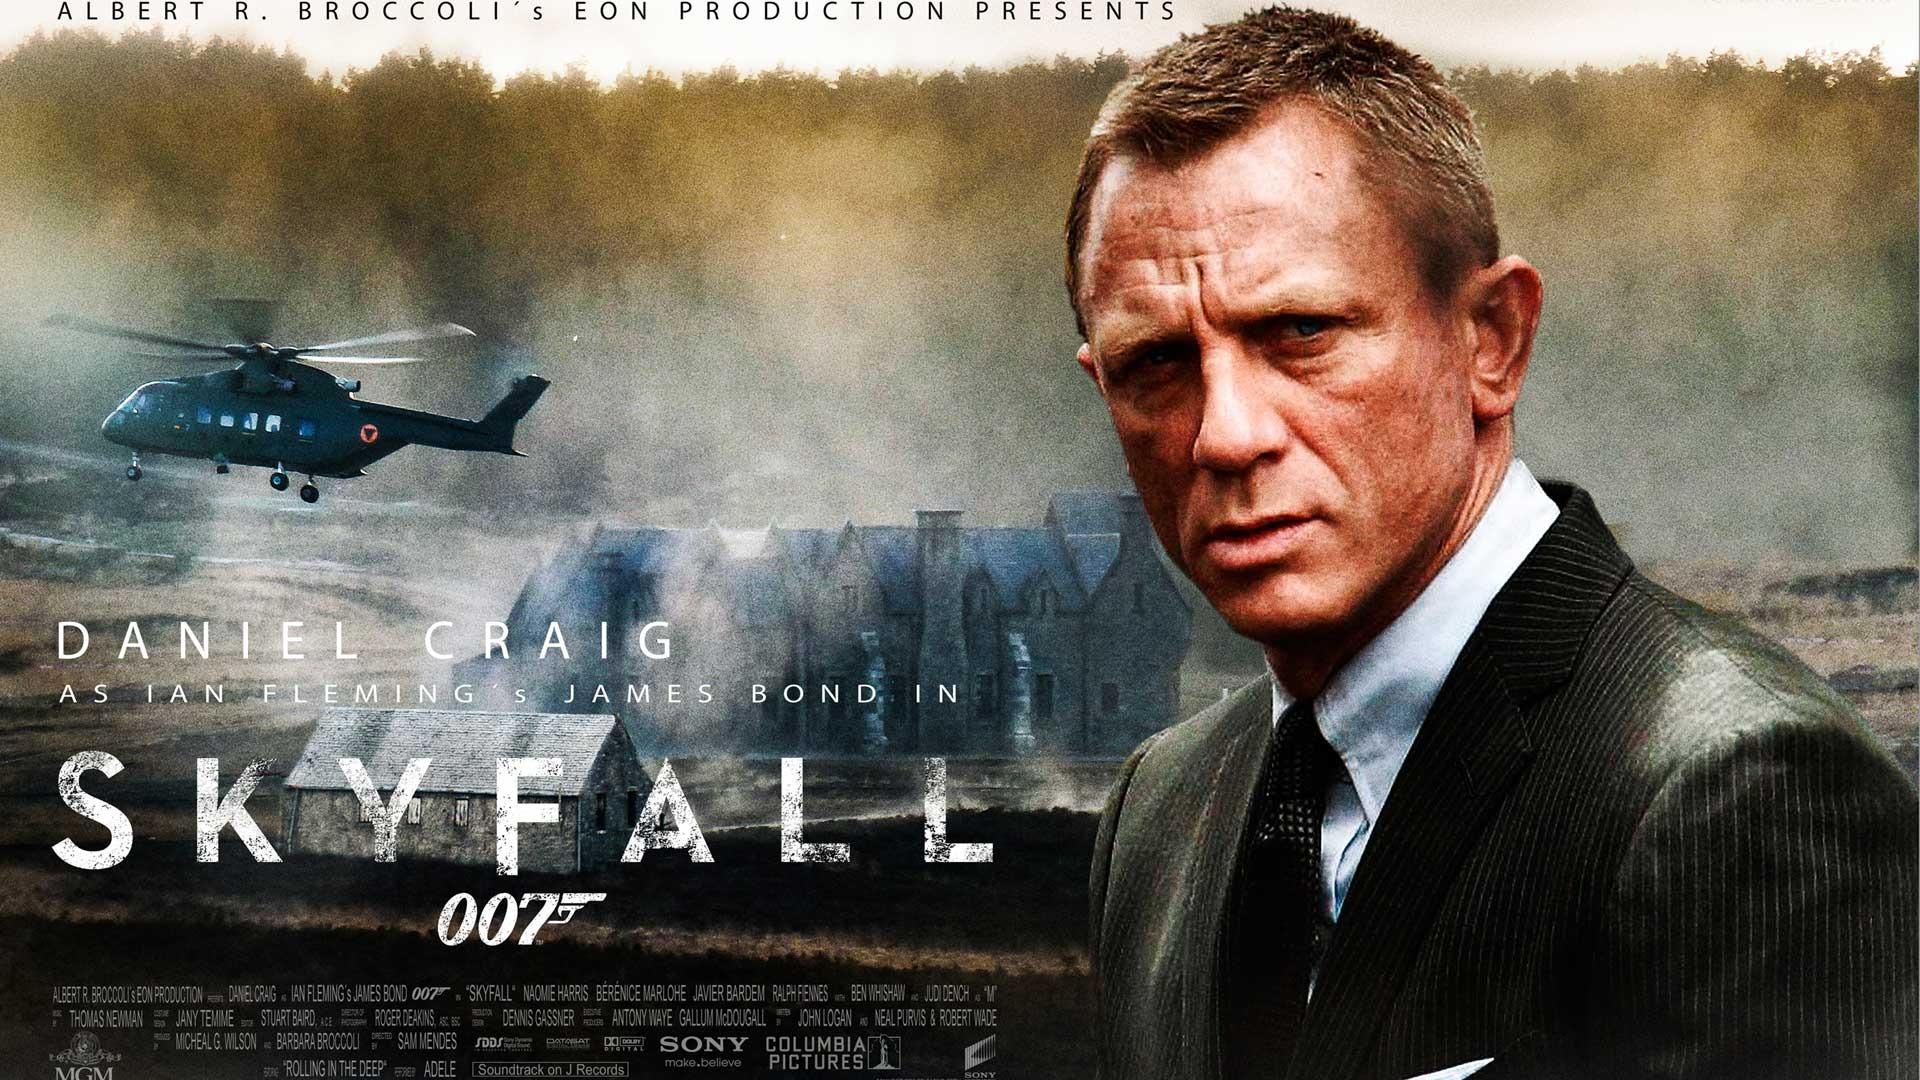 007 Skyfall 2012 Movie HD Desktop Wallpapers 02-1920x1080 ...